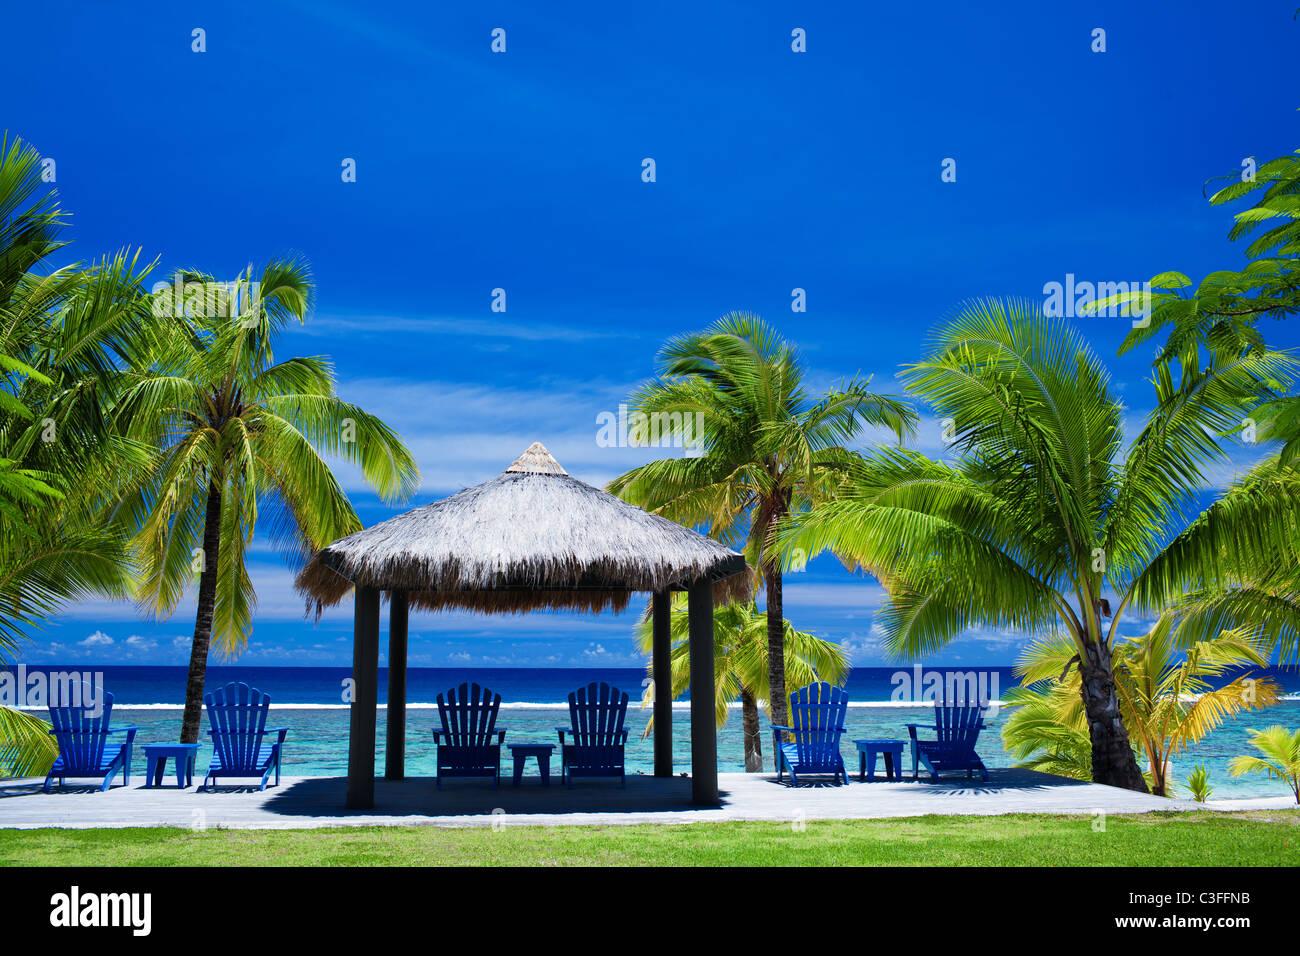 Blaue Stühle am Strand am Strand Stockbild